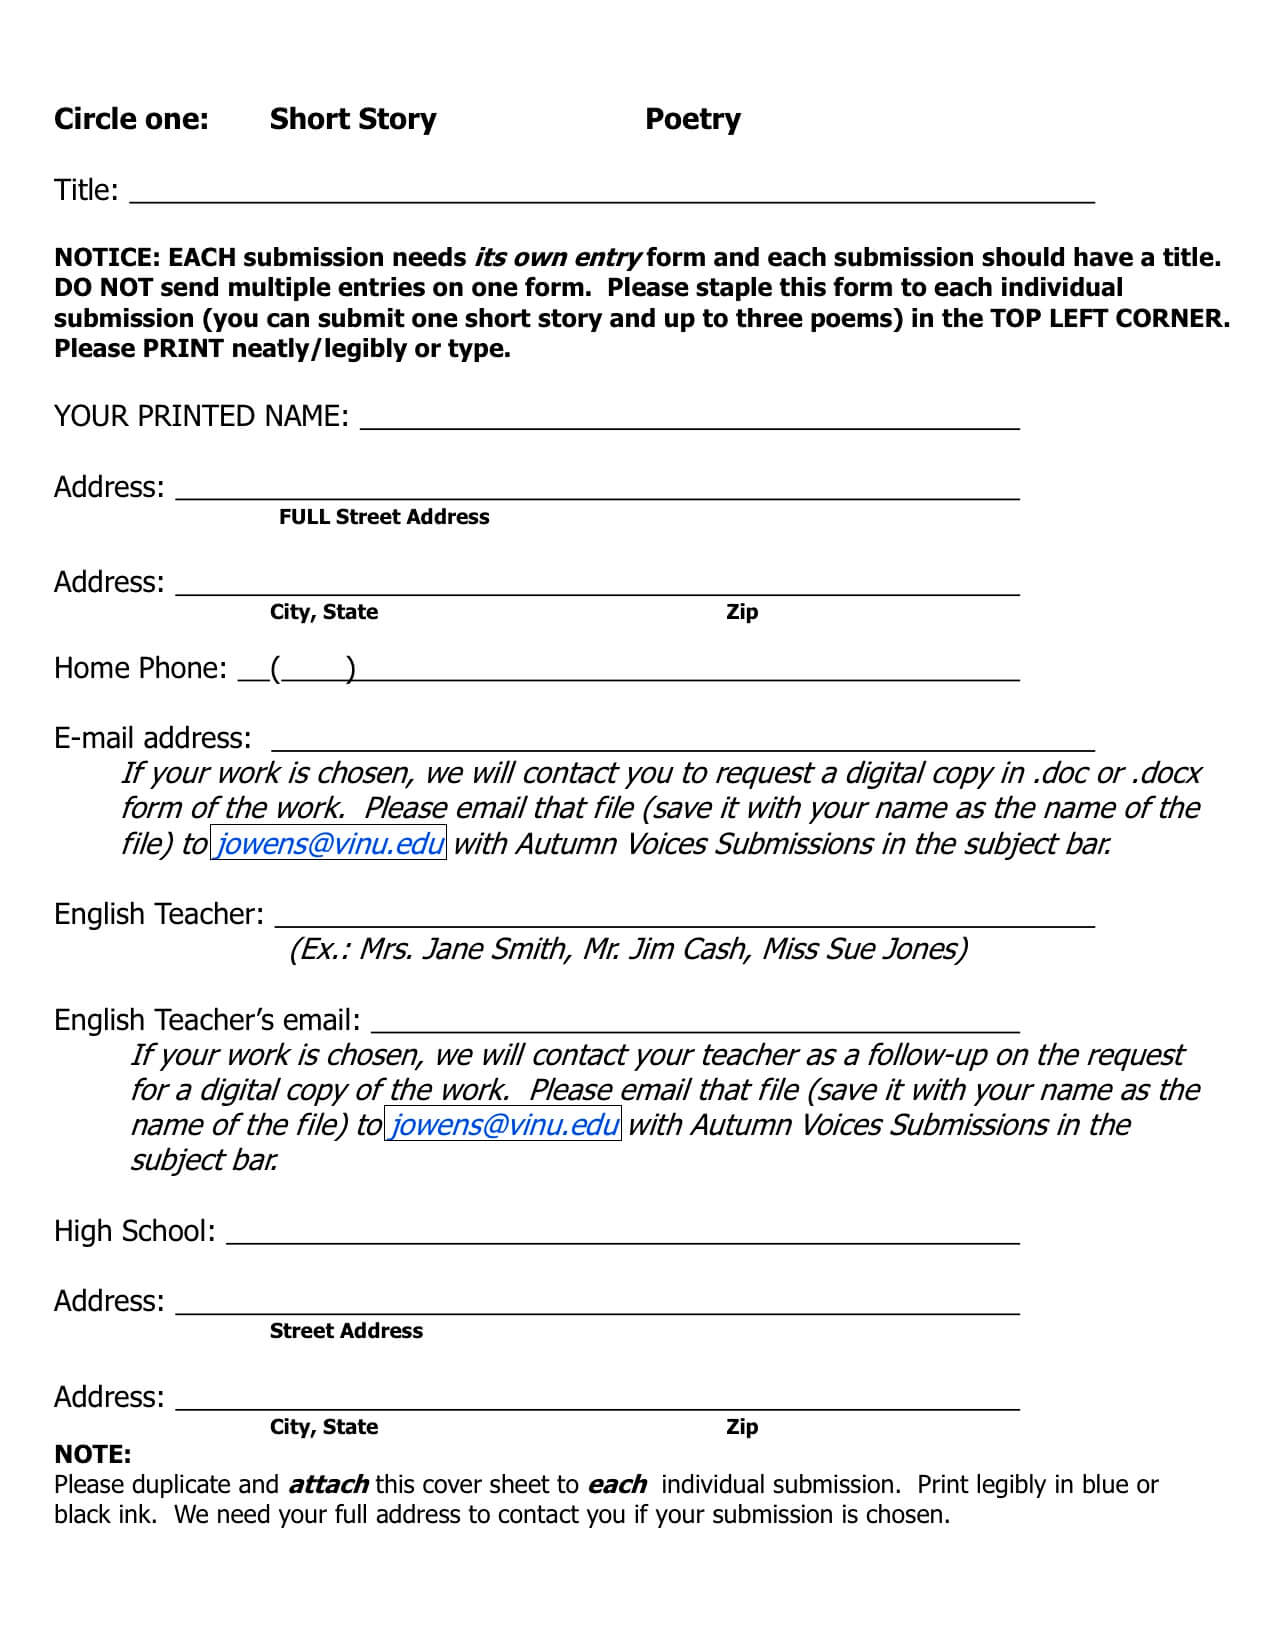 hslda essay contest 2014